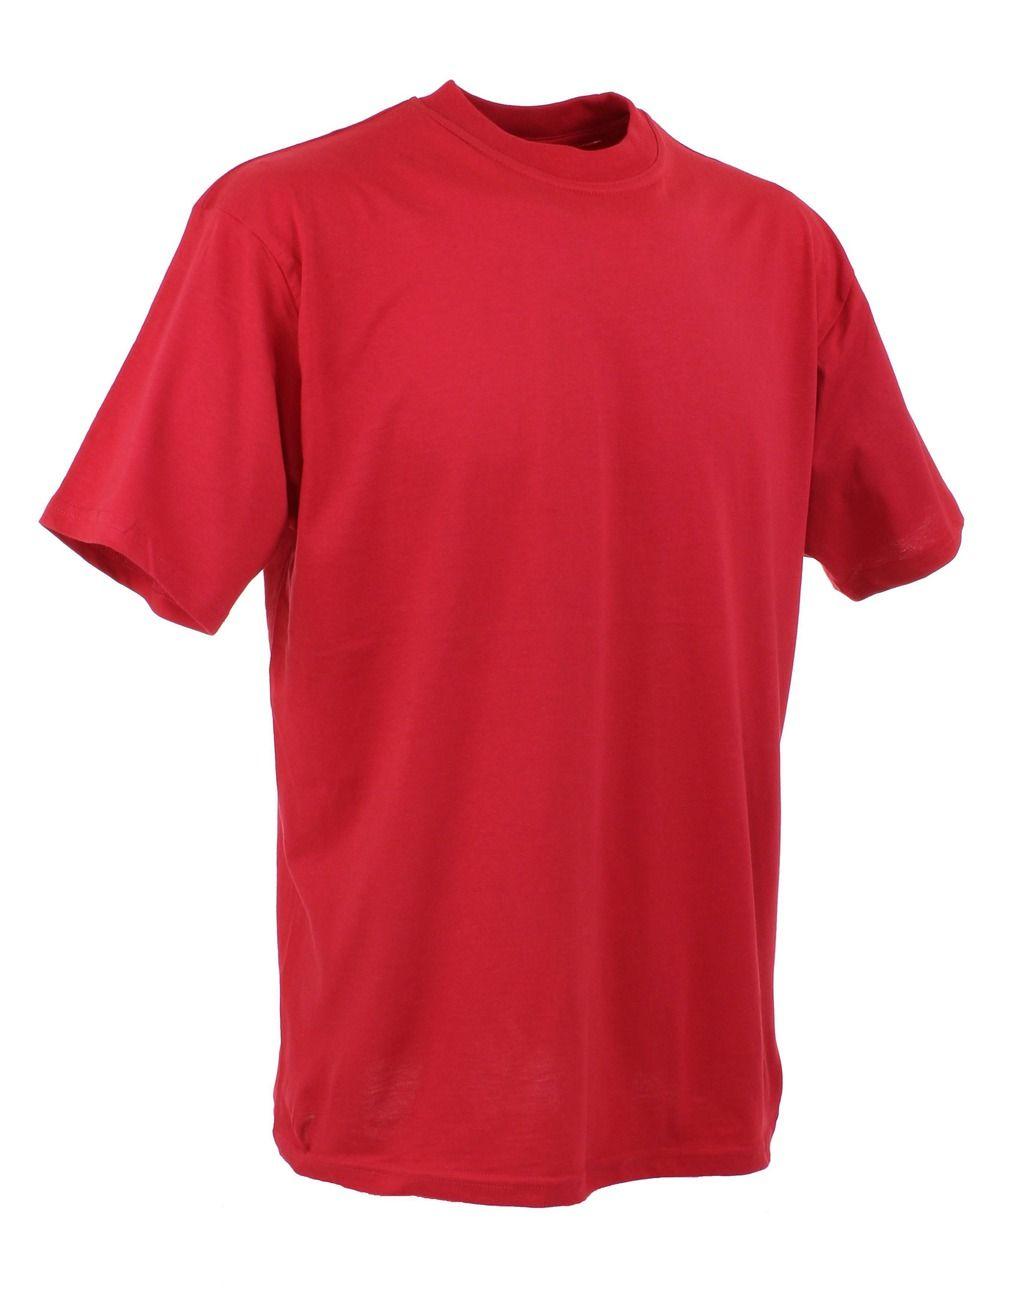 AD T-shirt